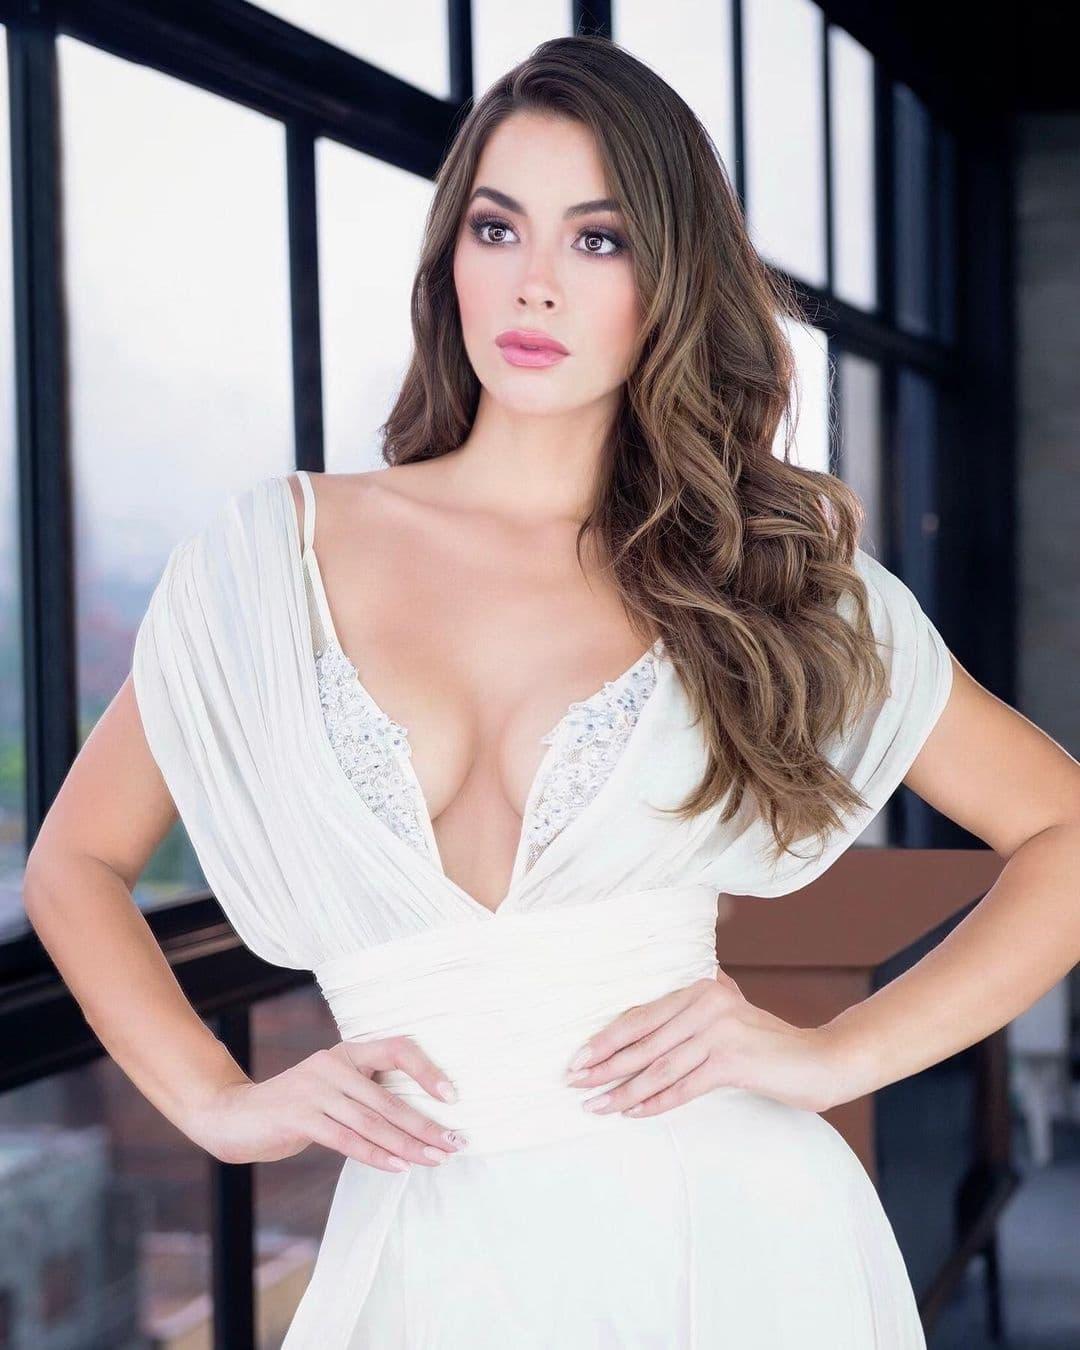 maria alejandra lopez perez, top 2 de miss universe colombia 2021/reyna hispanoamericana 2013/miss caraibes hibiscus 2014/miss colombia mundo 2015. - Página 5 24190712